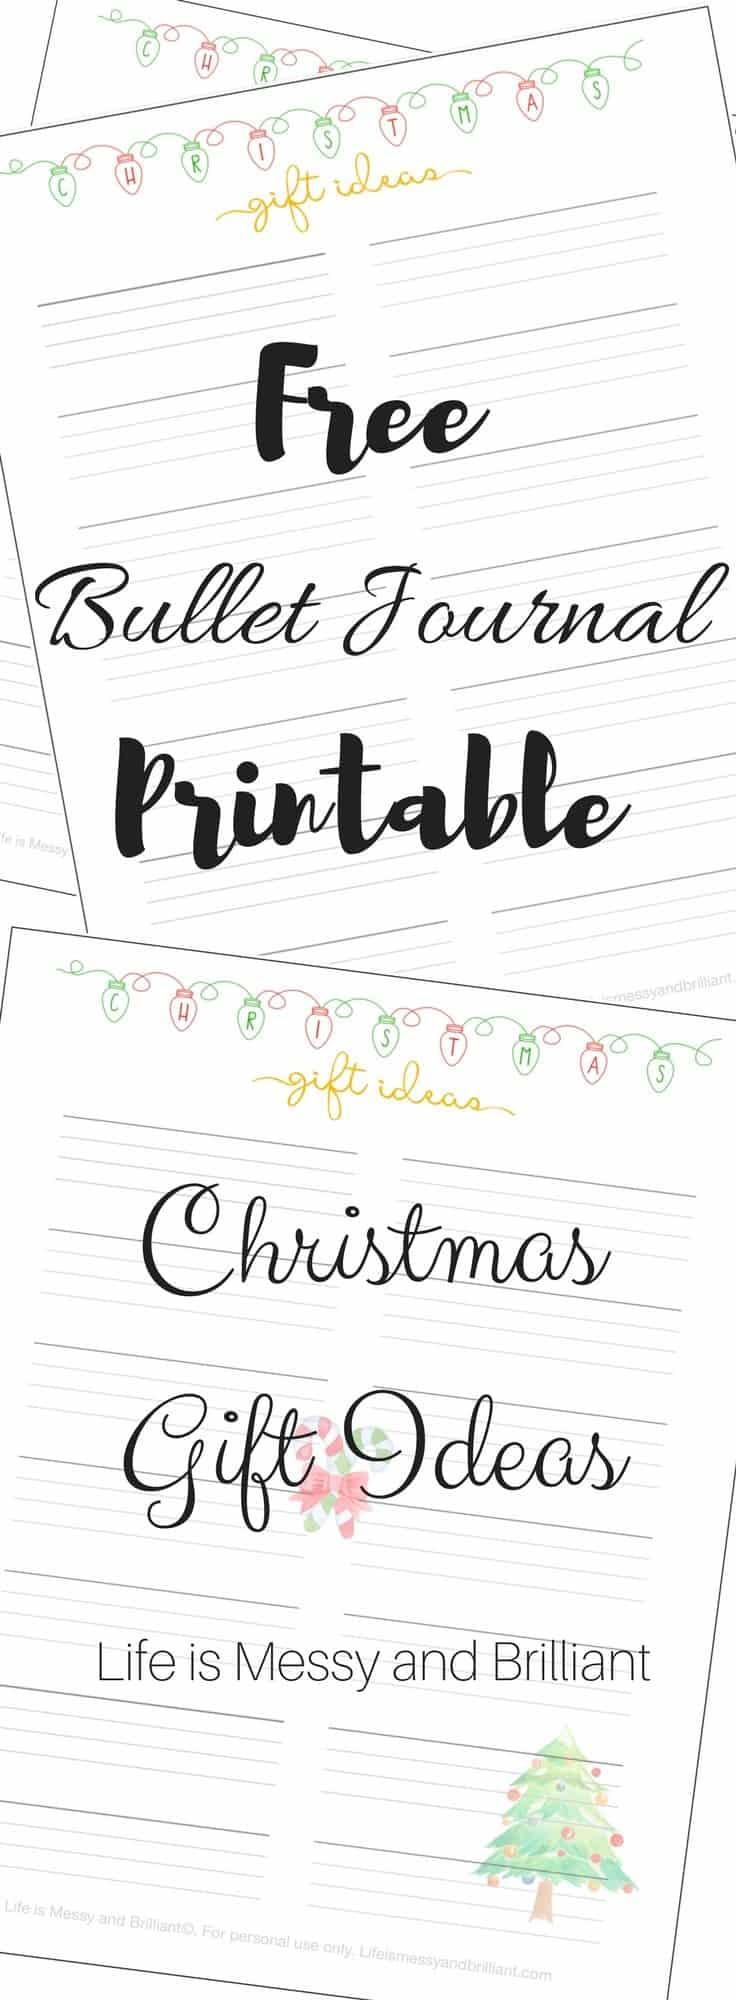 Free Christmas Gift Ideas Bullet Journal Printable